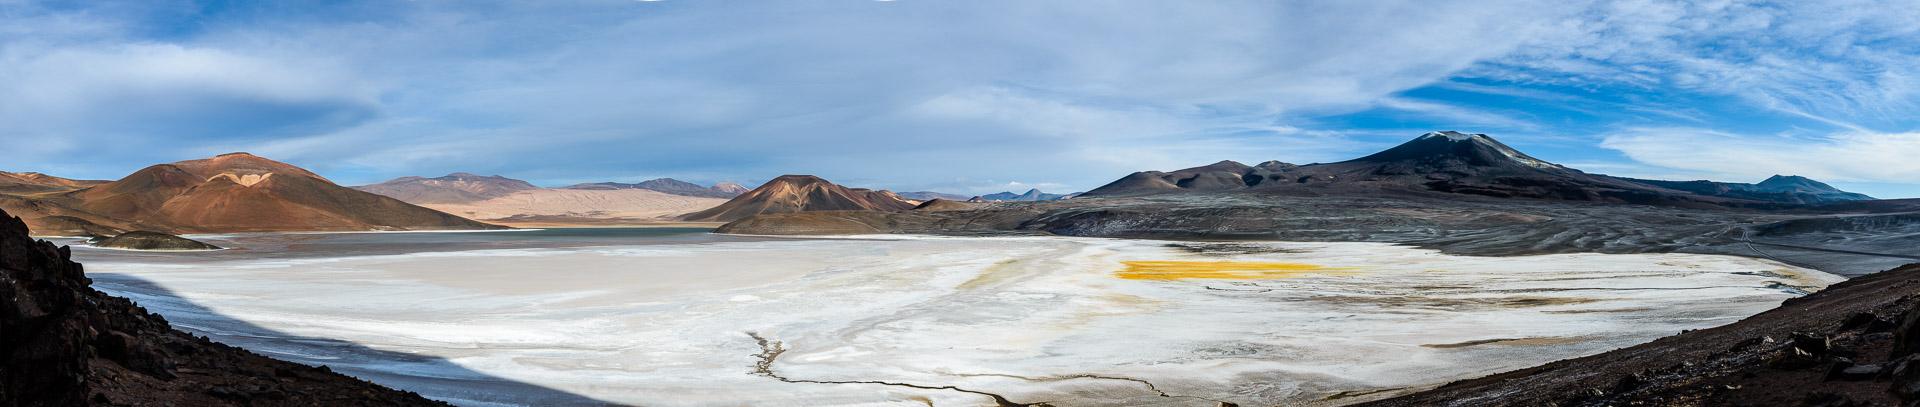 Laguna de la Azufrera, volcano Lastarria